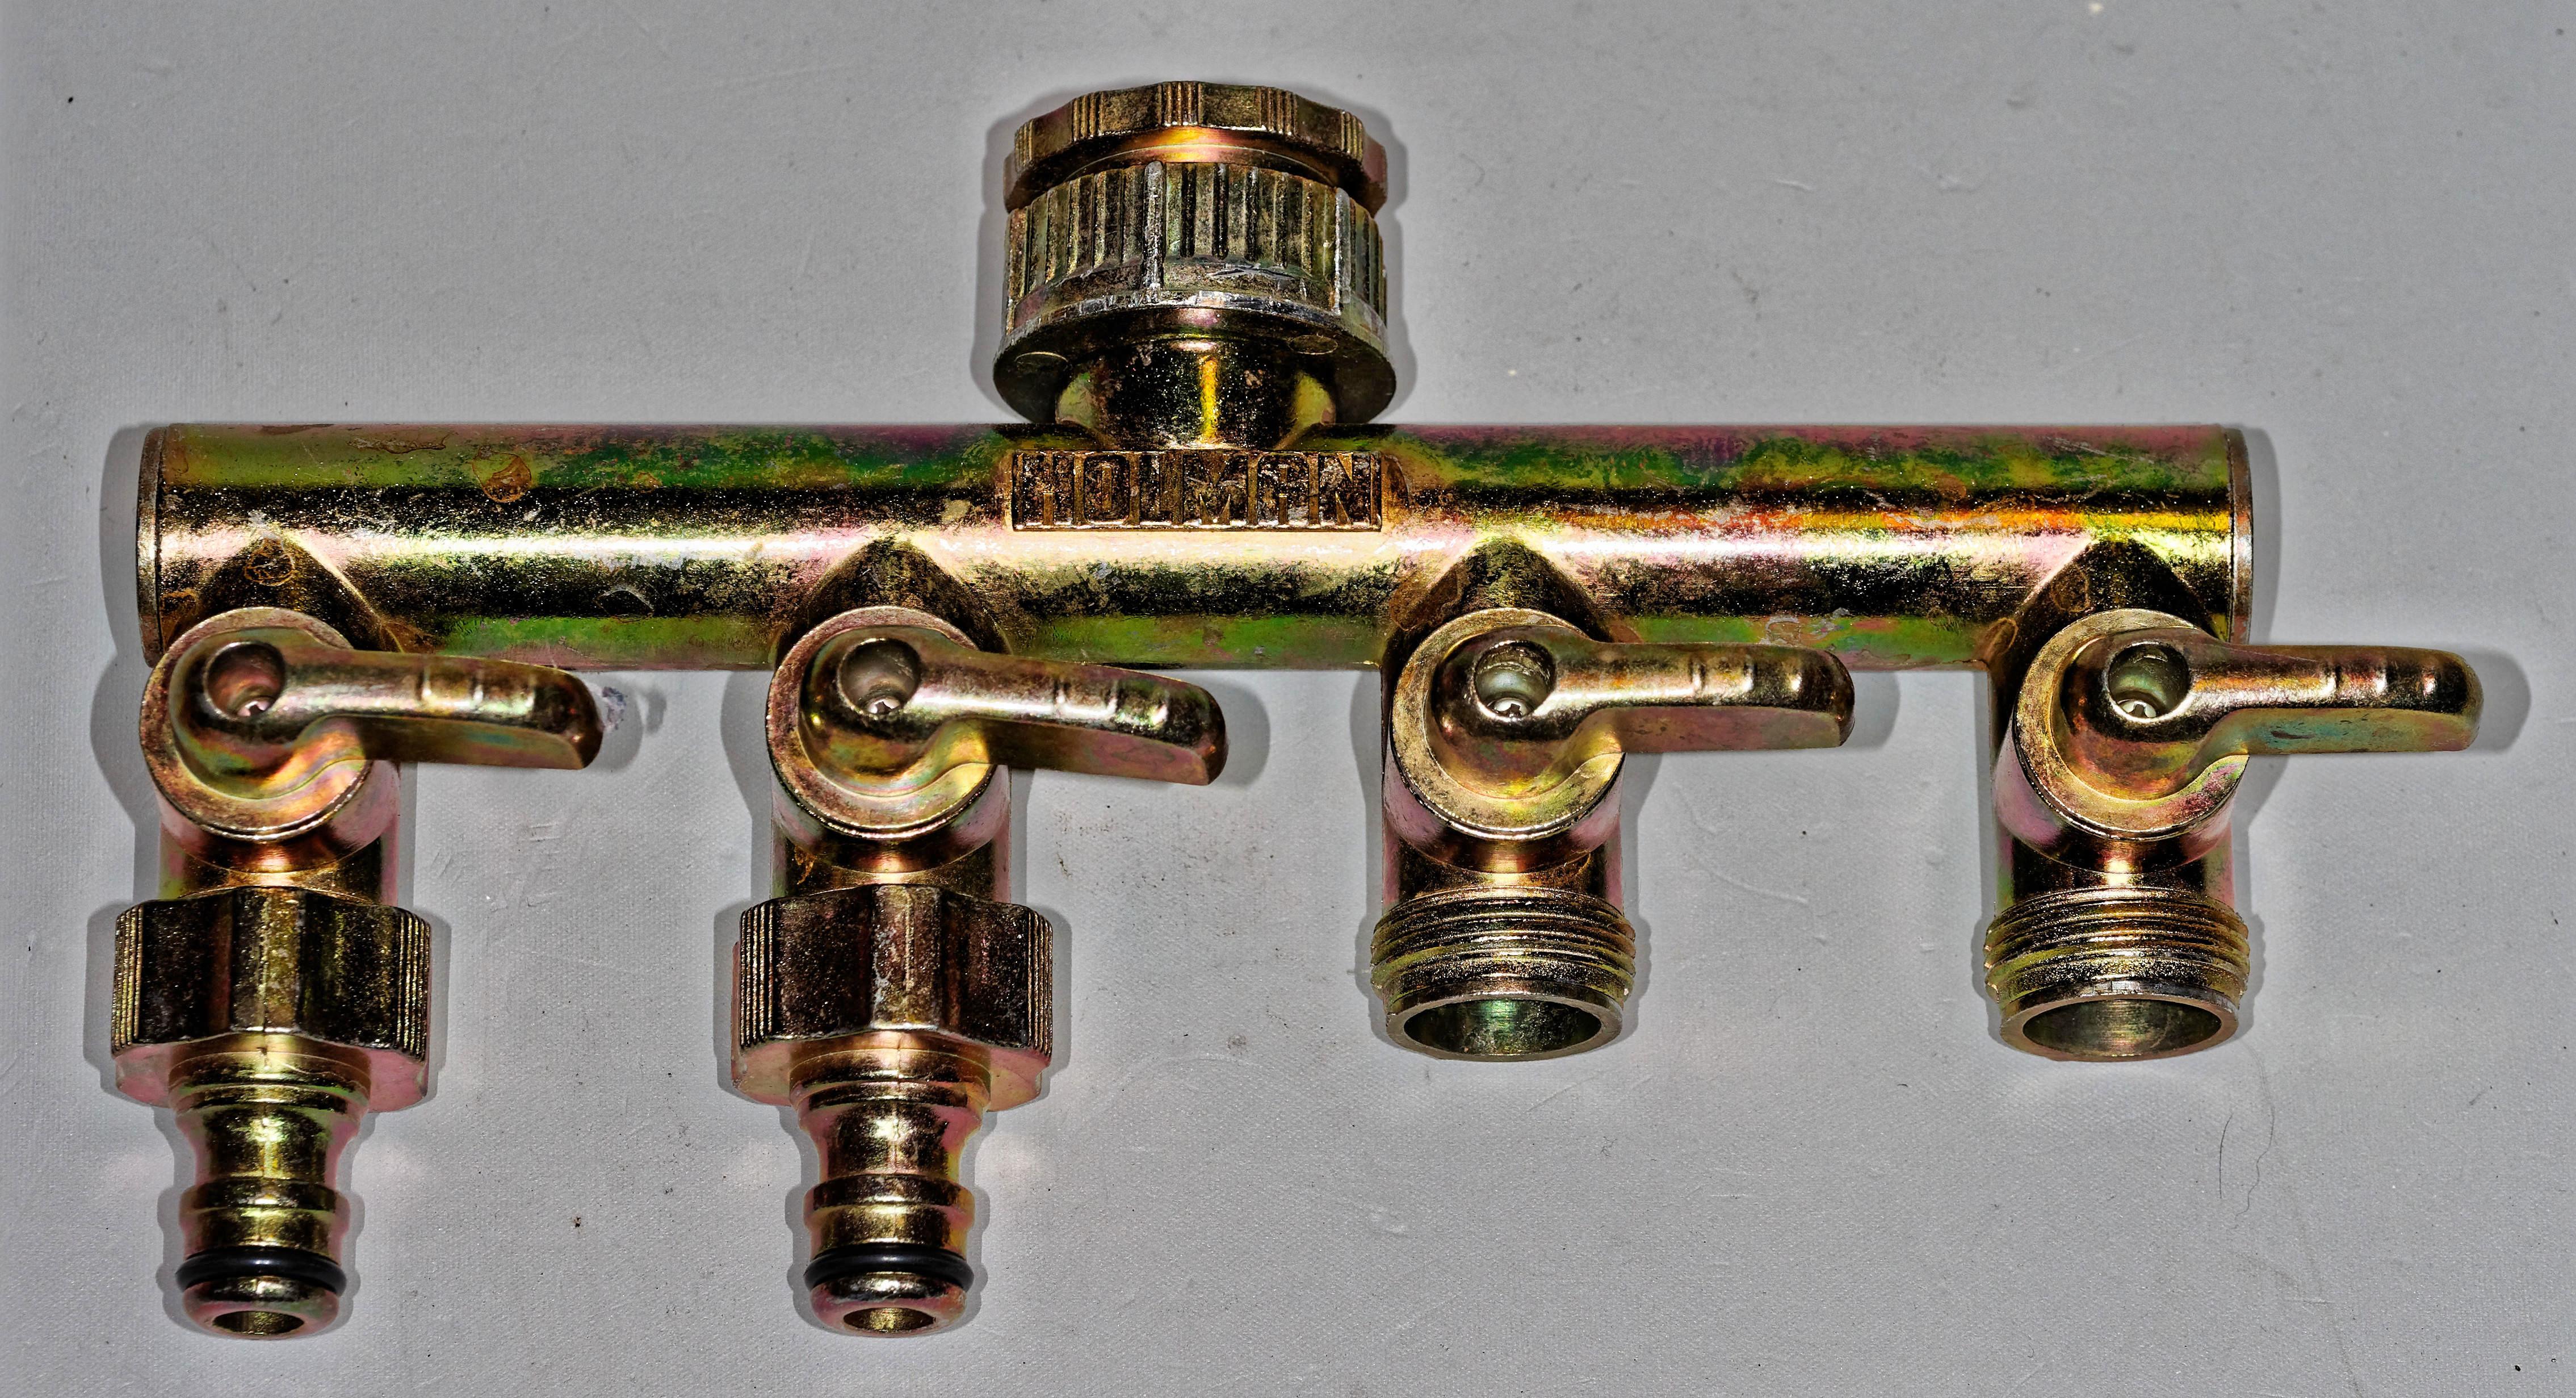 Four-way-adapter-2.jpeg